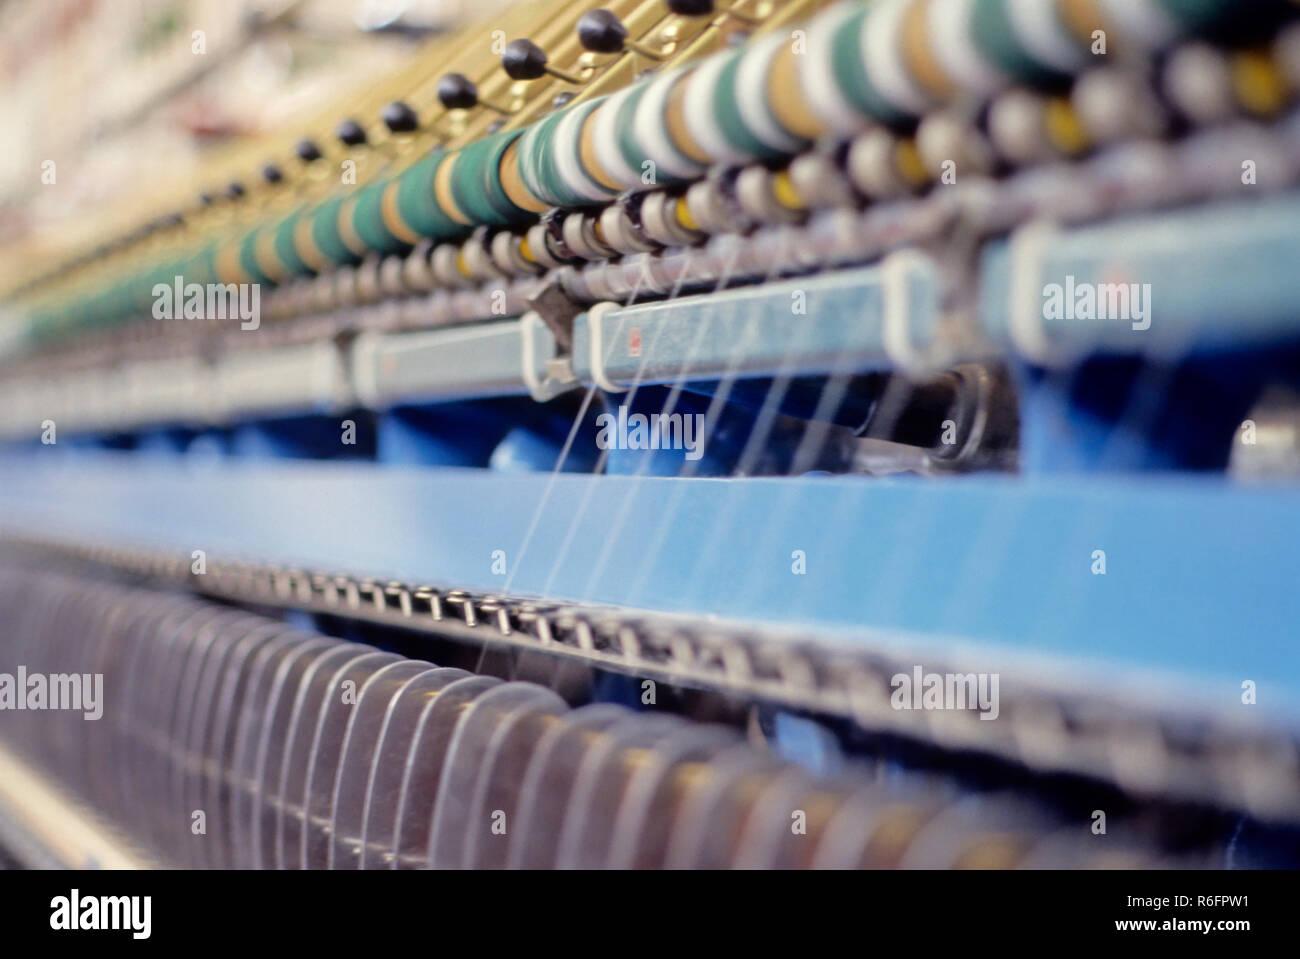 Textile - Stock Image